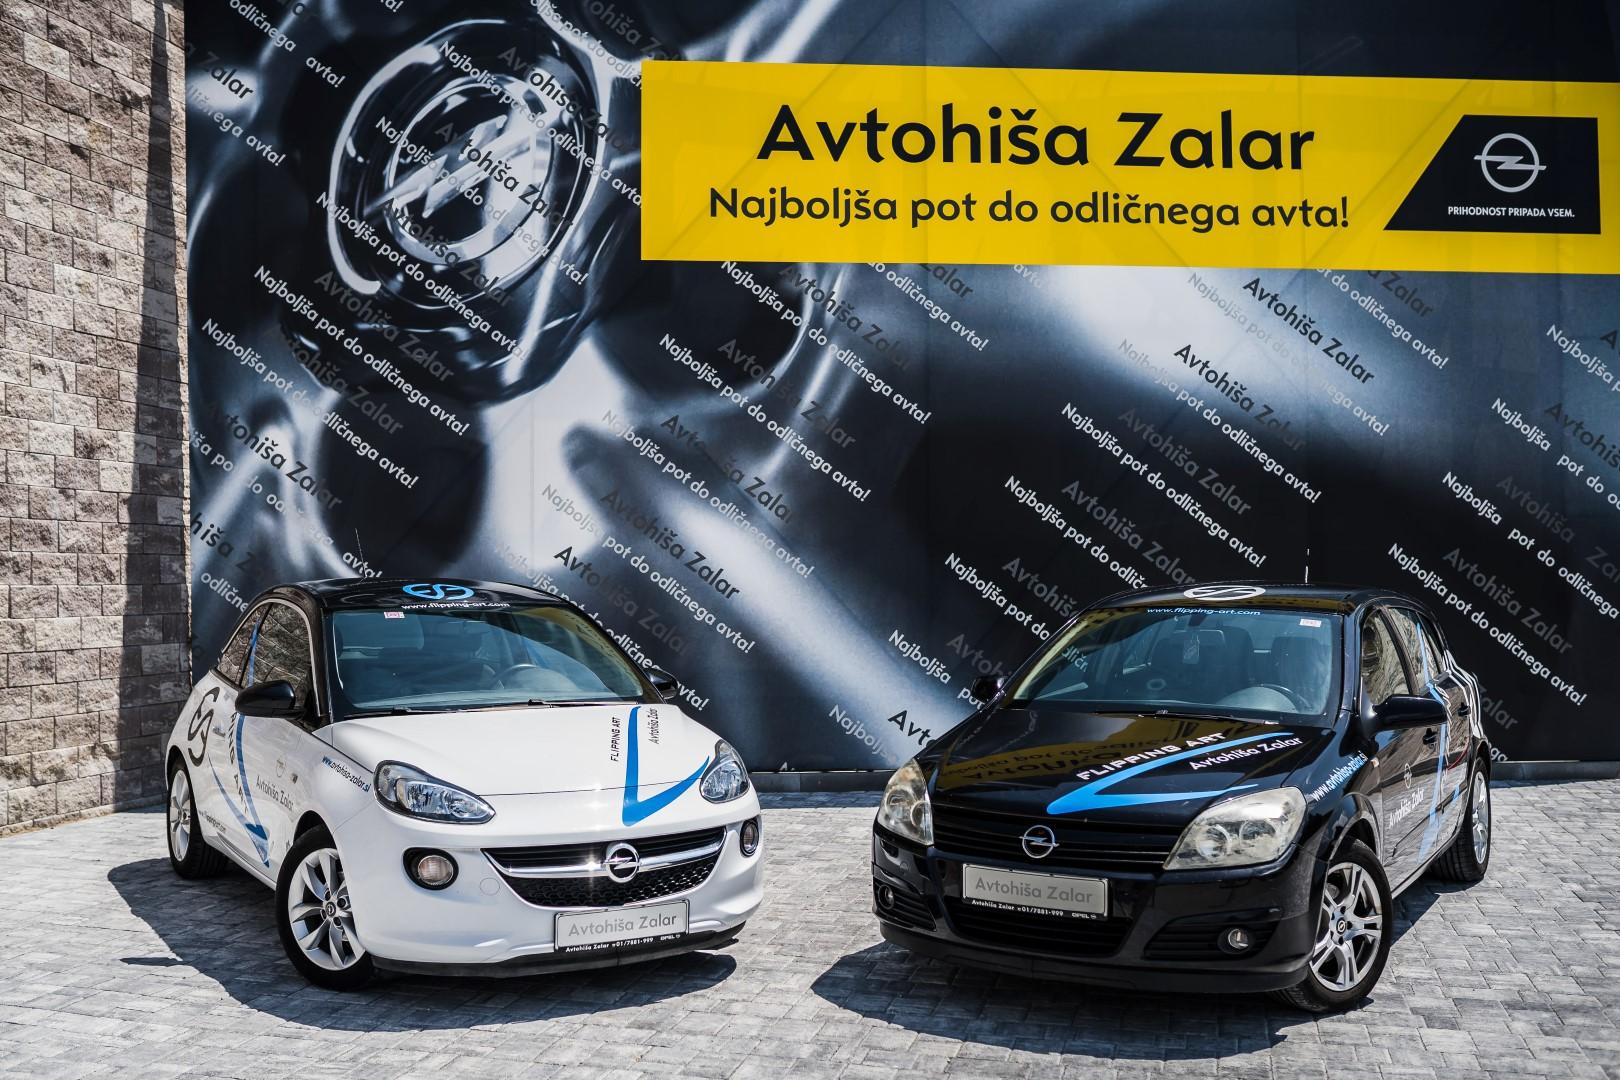 avtohisa-zalar-flipping-art-slovenija-ima-talent (11)